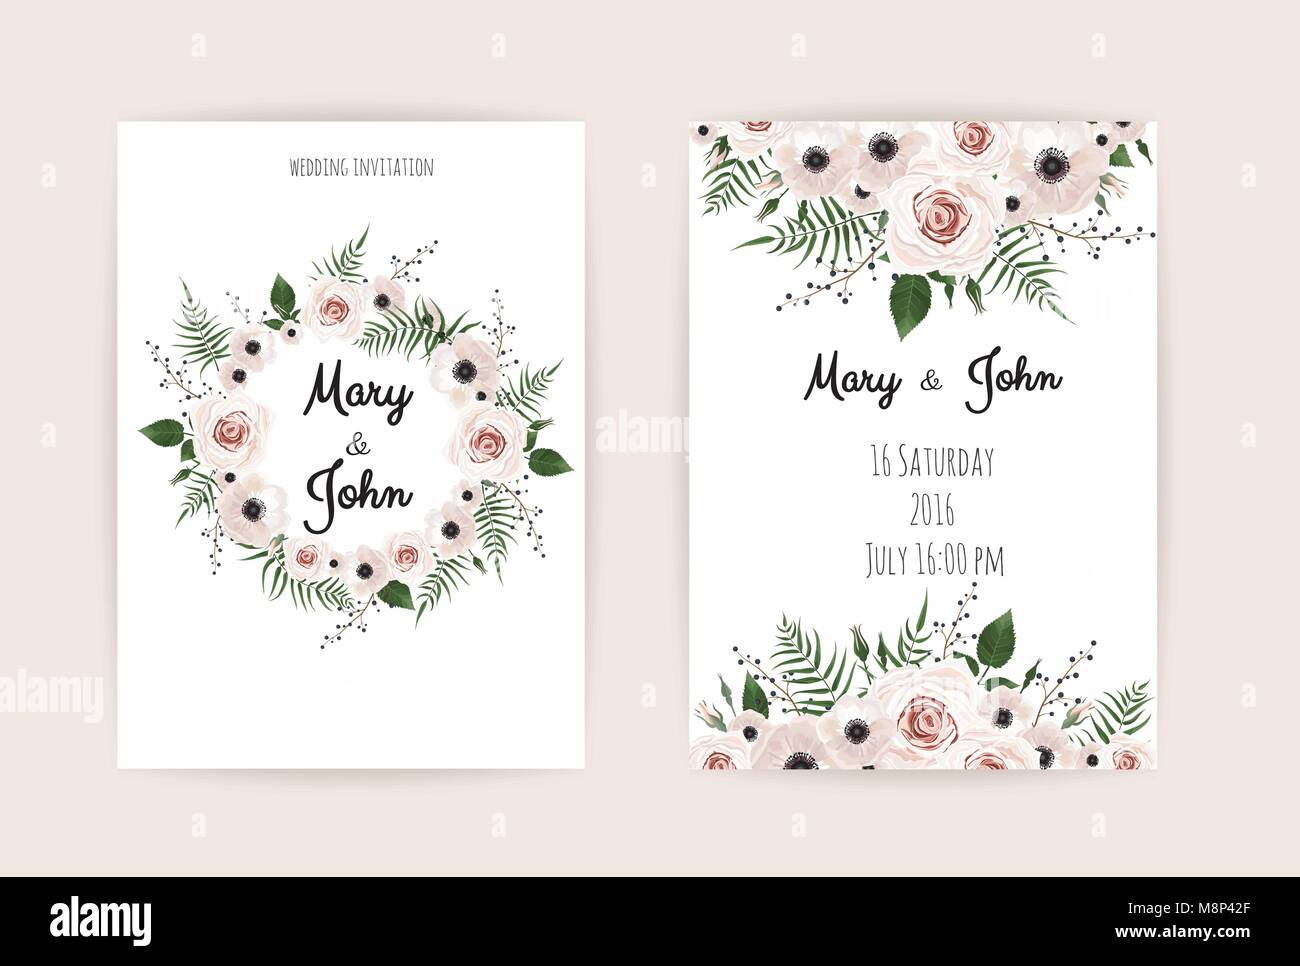 Wedding Invitation Modern Card Design Vector Elegant Watercolor Stock Vector Image Art Alamy